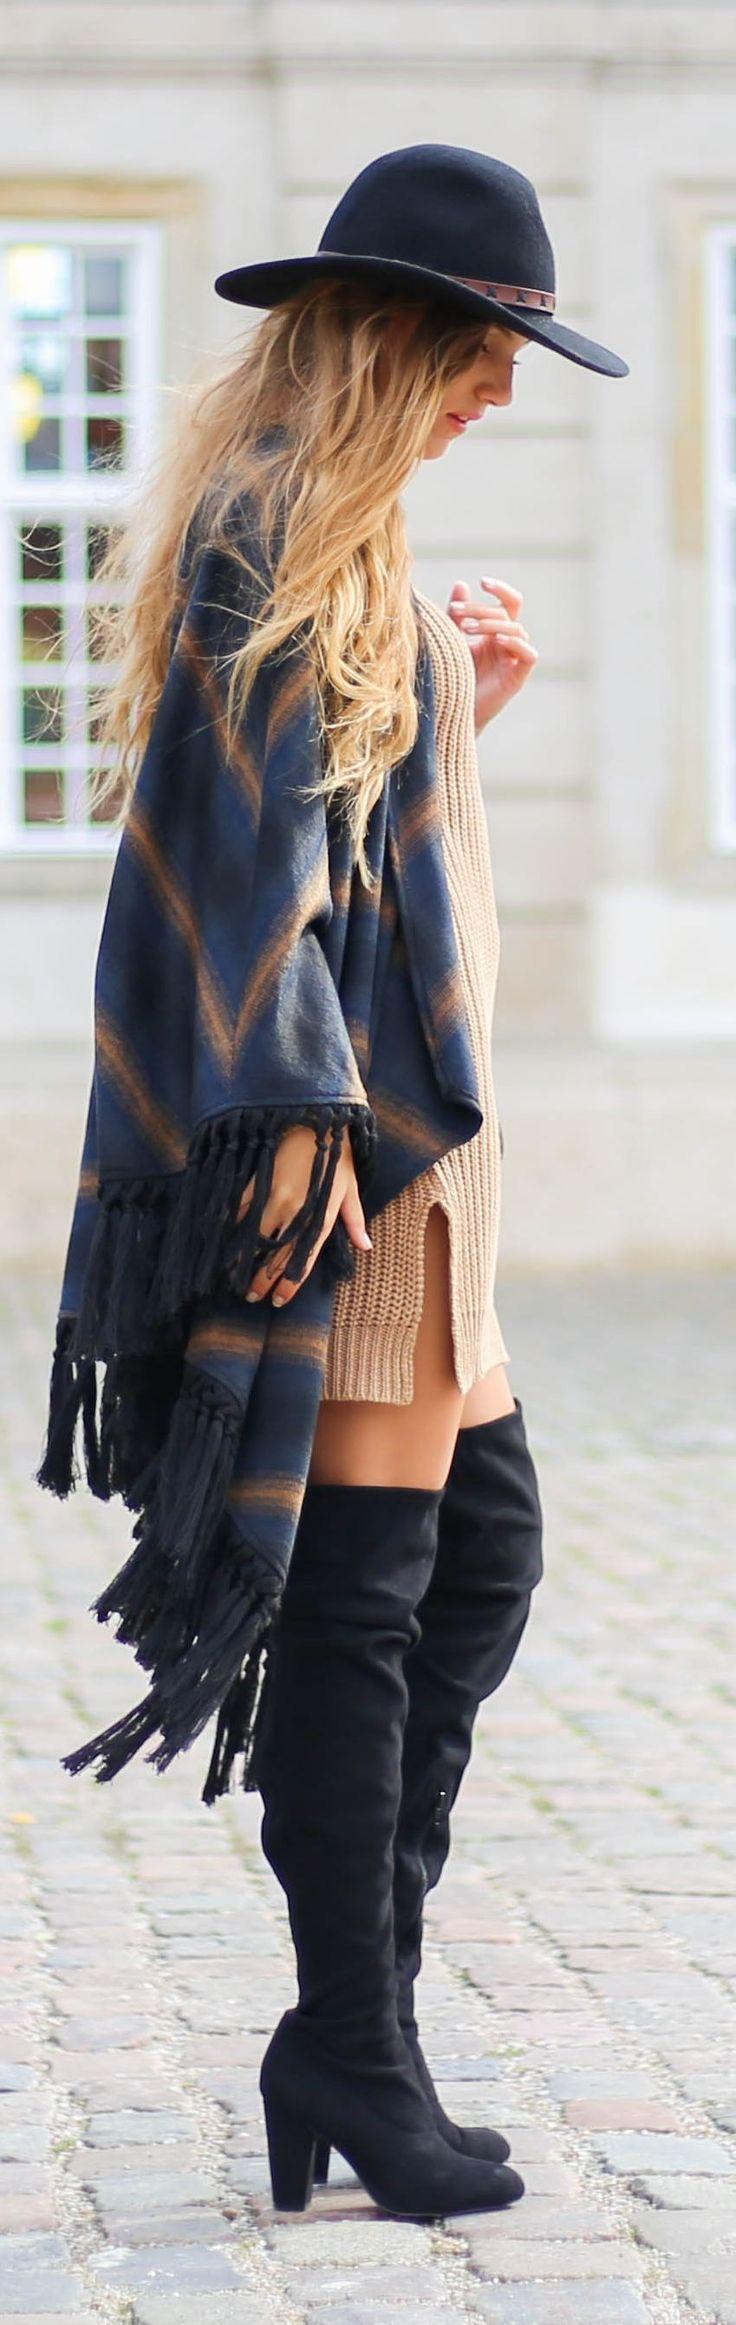 Incredible Fall Fashion Outfits Boho